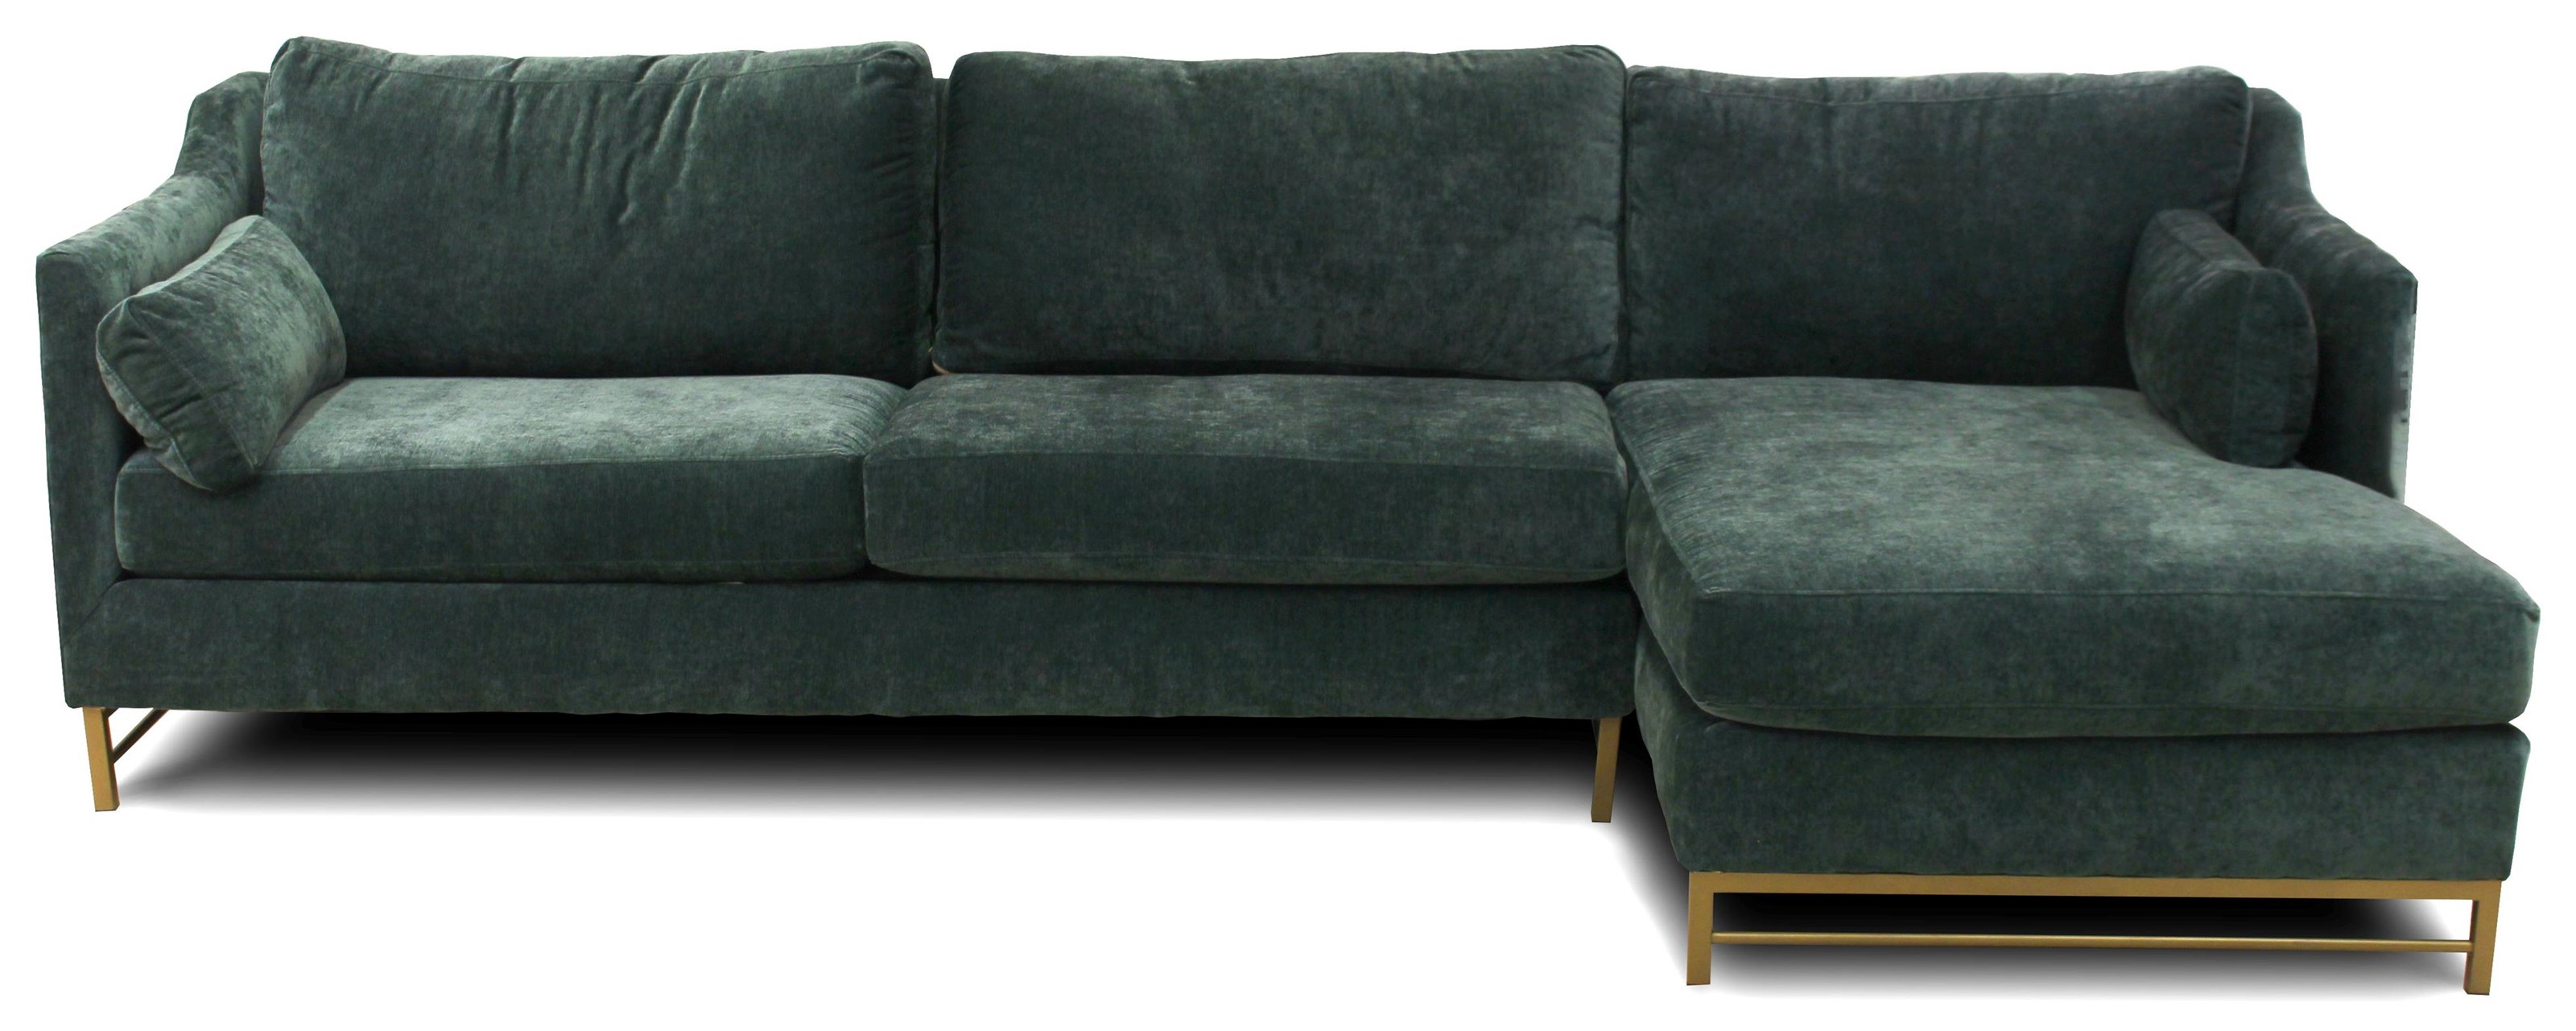 Haylee 3-Seat Modular Chaise Sofa w/ RAF Chaise by Metropia at Ruby Gordon Home